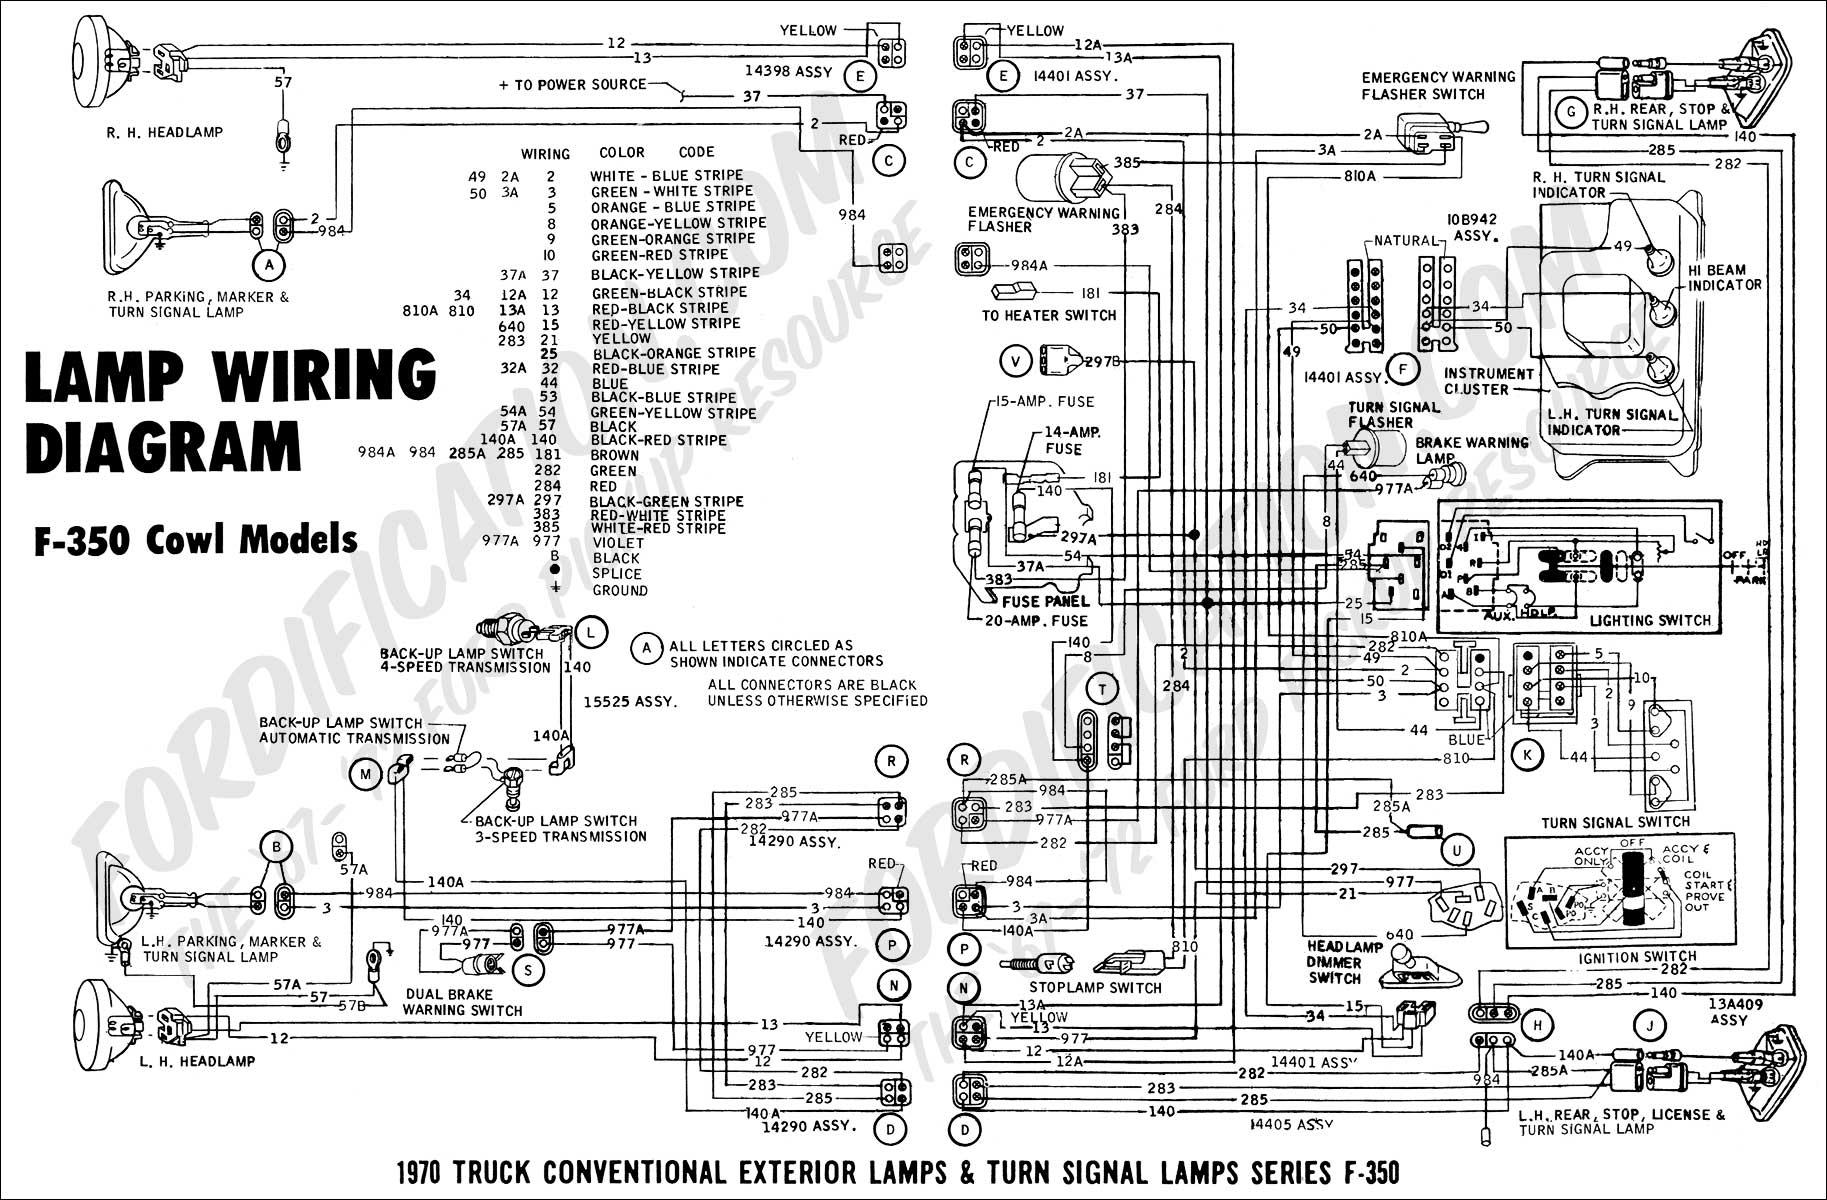 73 Nova Wiring Diagram | Wiring Liry  Kia Rio Kelights Wiring Diagram on